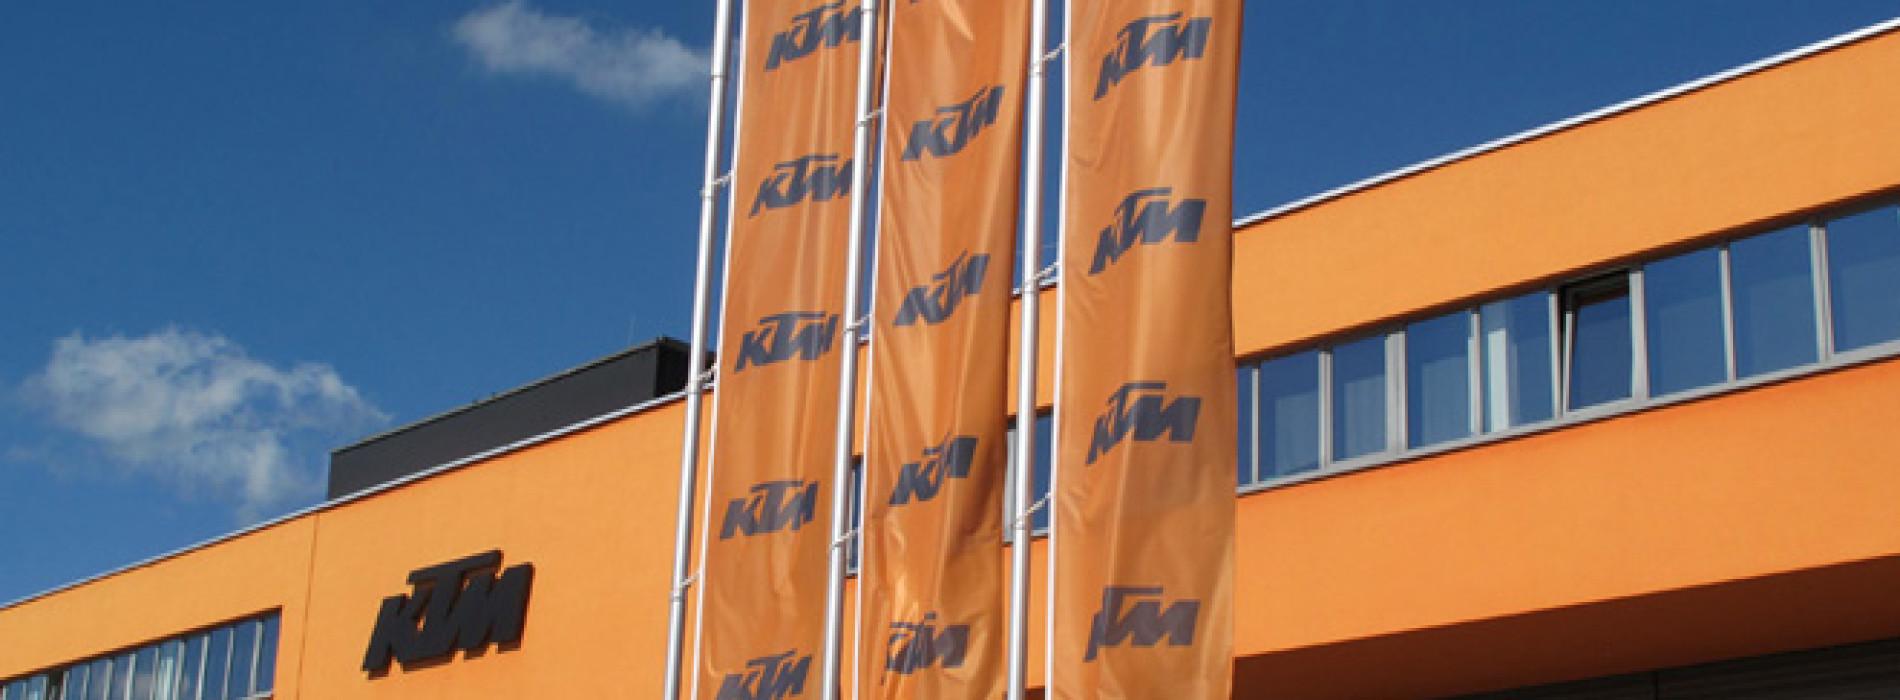 KTM Interviews: Stefan Everts, Pit Beirer and Dirk Gruebel